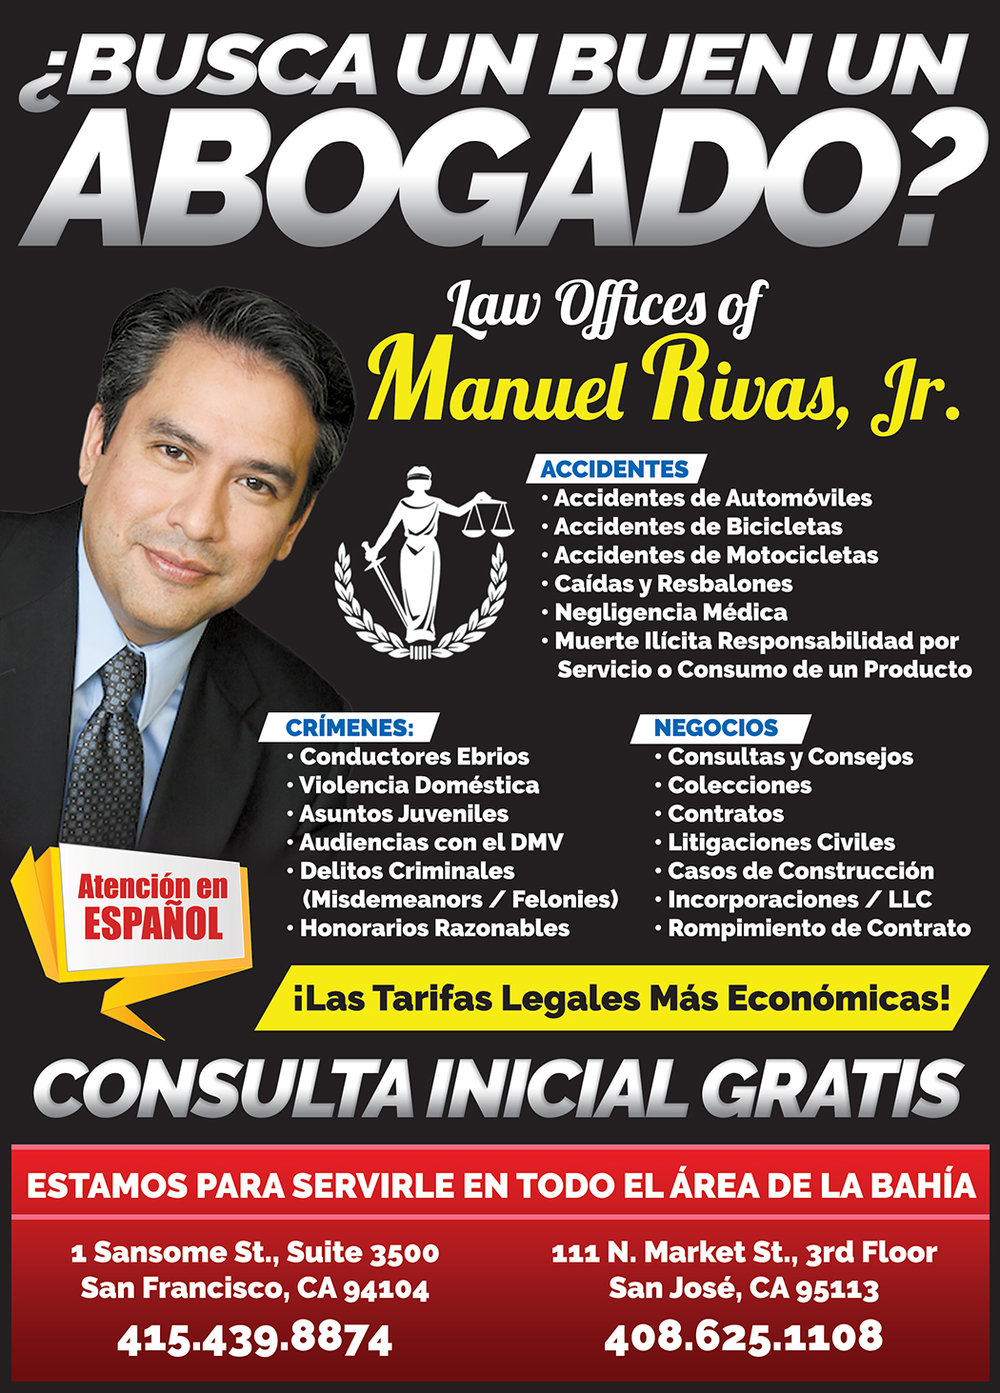 Manuel Rivas JR 1pag ABRI 2017 copy.jpg